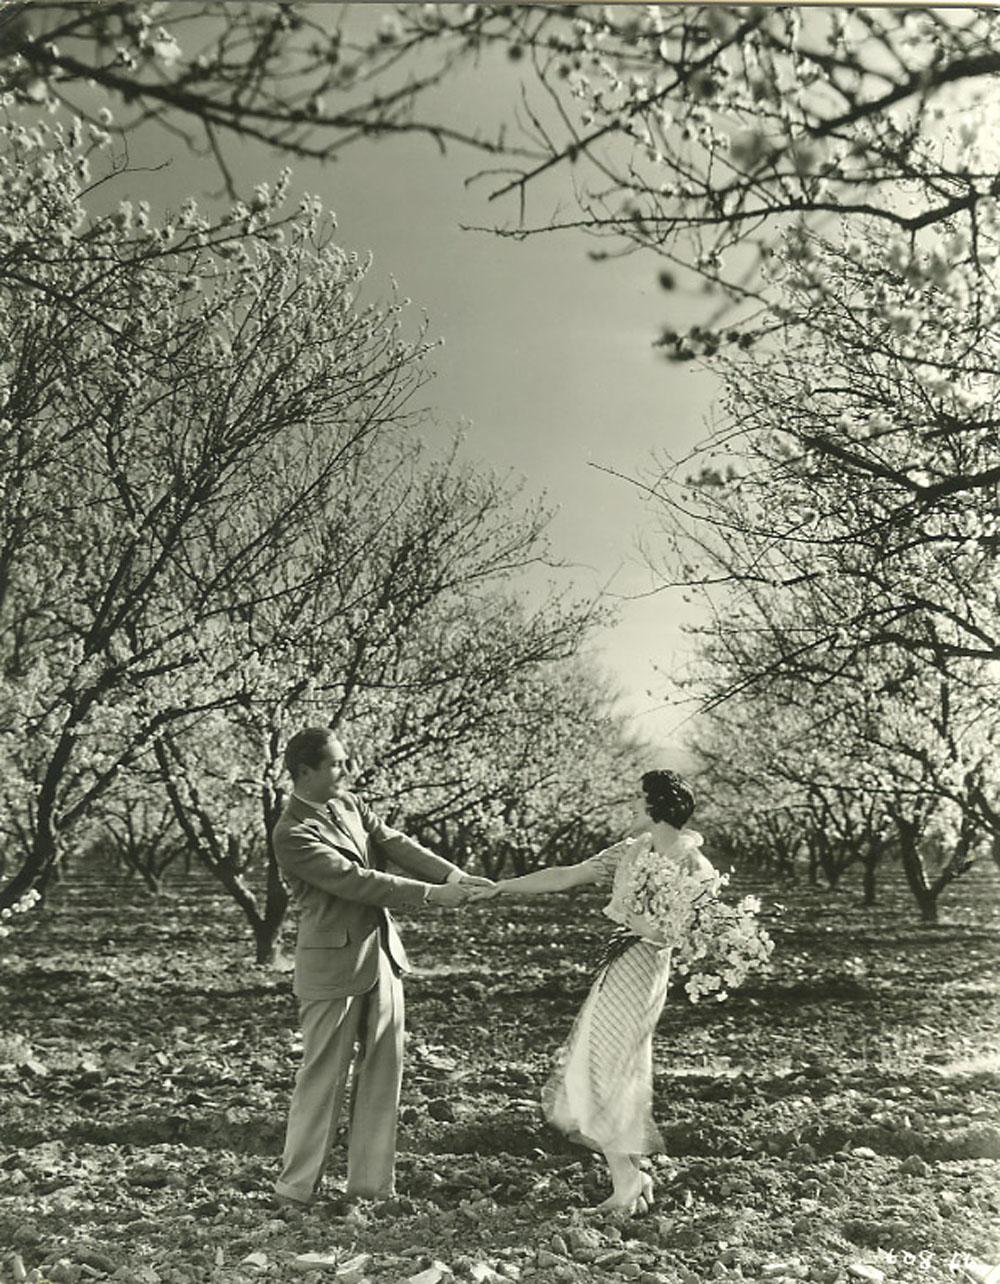 Alexander Kirkland, Norma Shearer in Strange Interlude